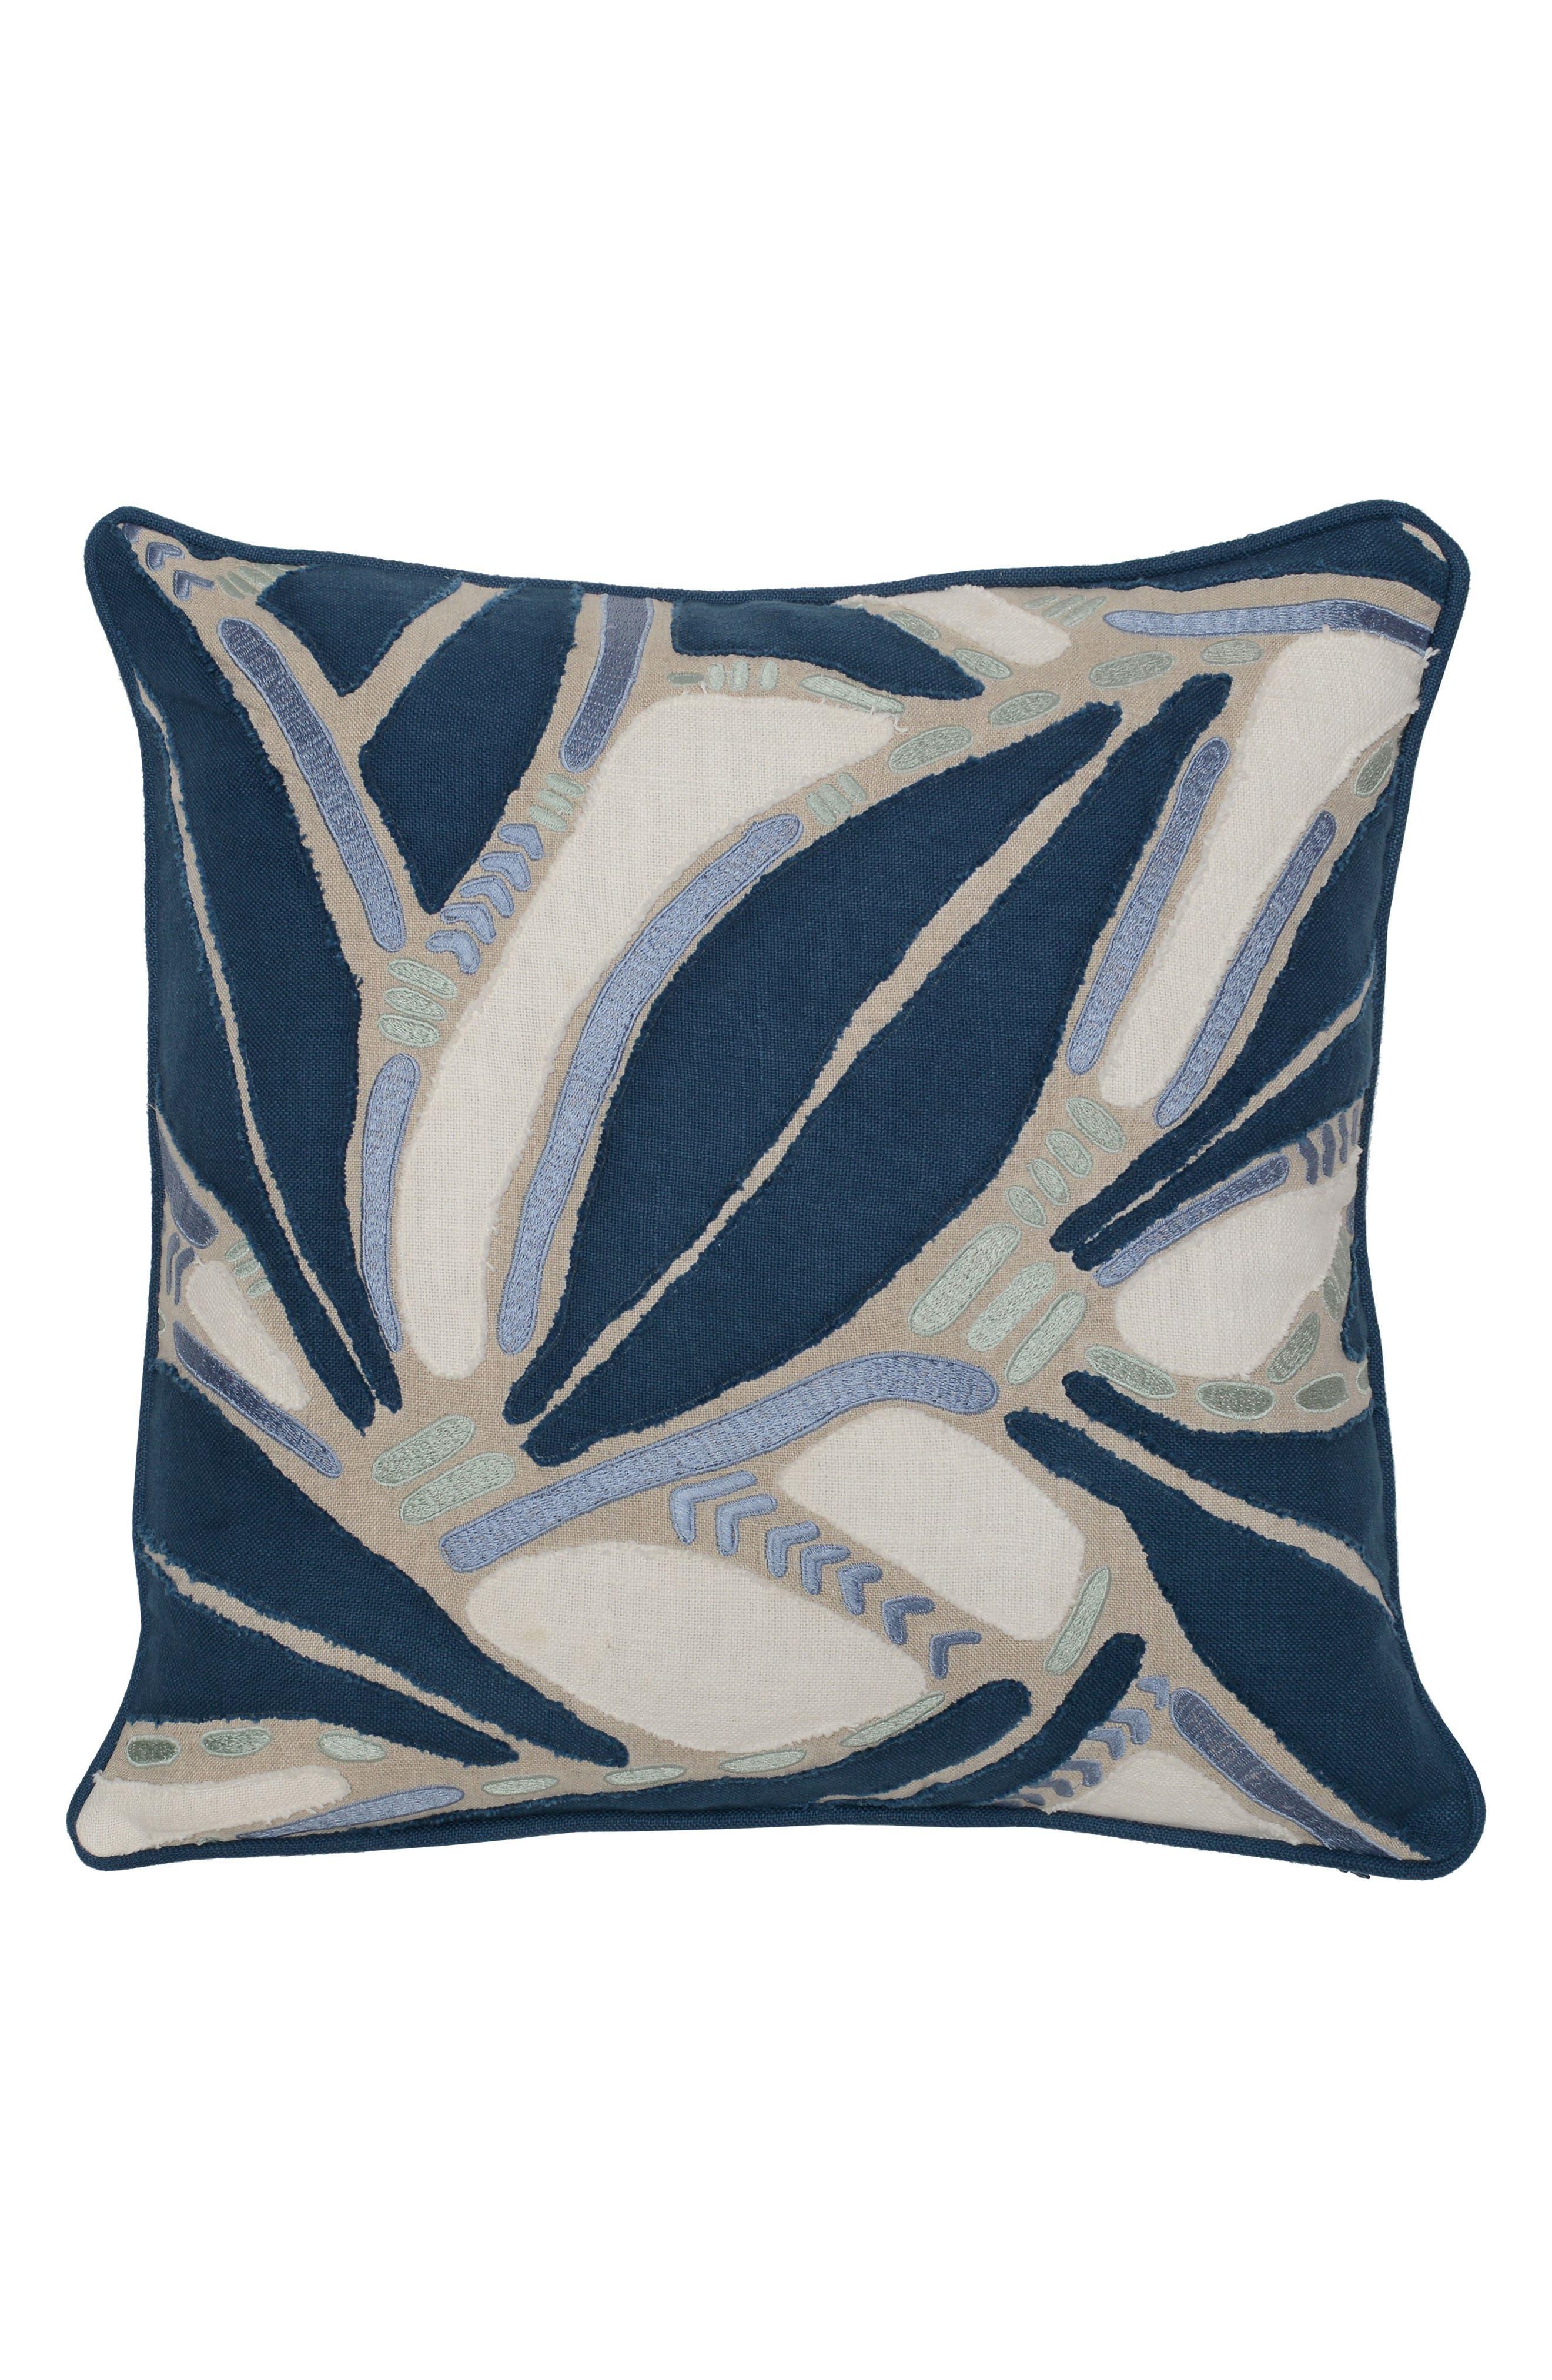 Villa Home Collection Lilo Accent Pillow